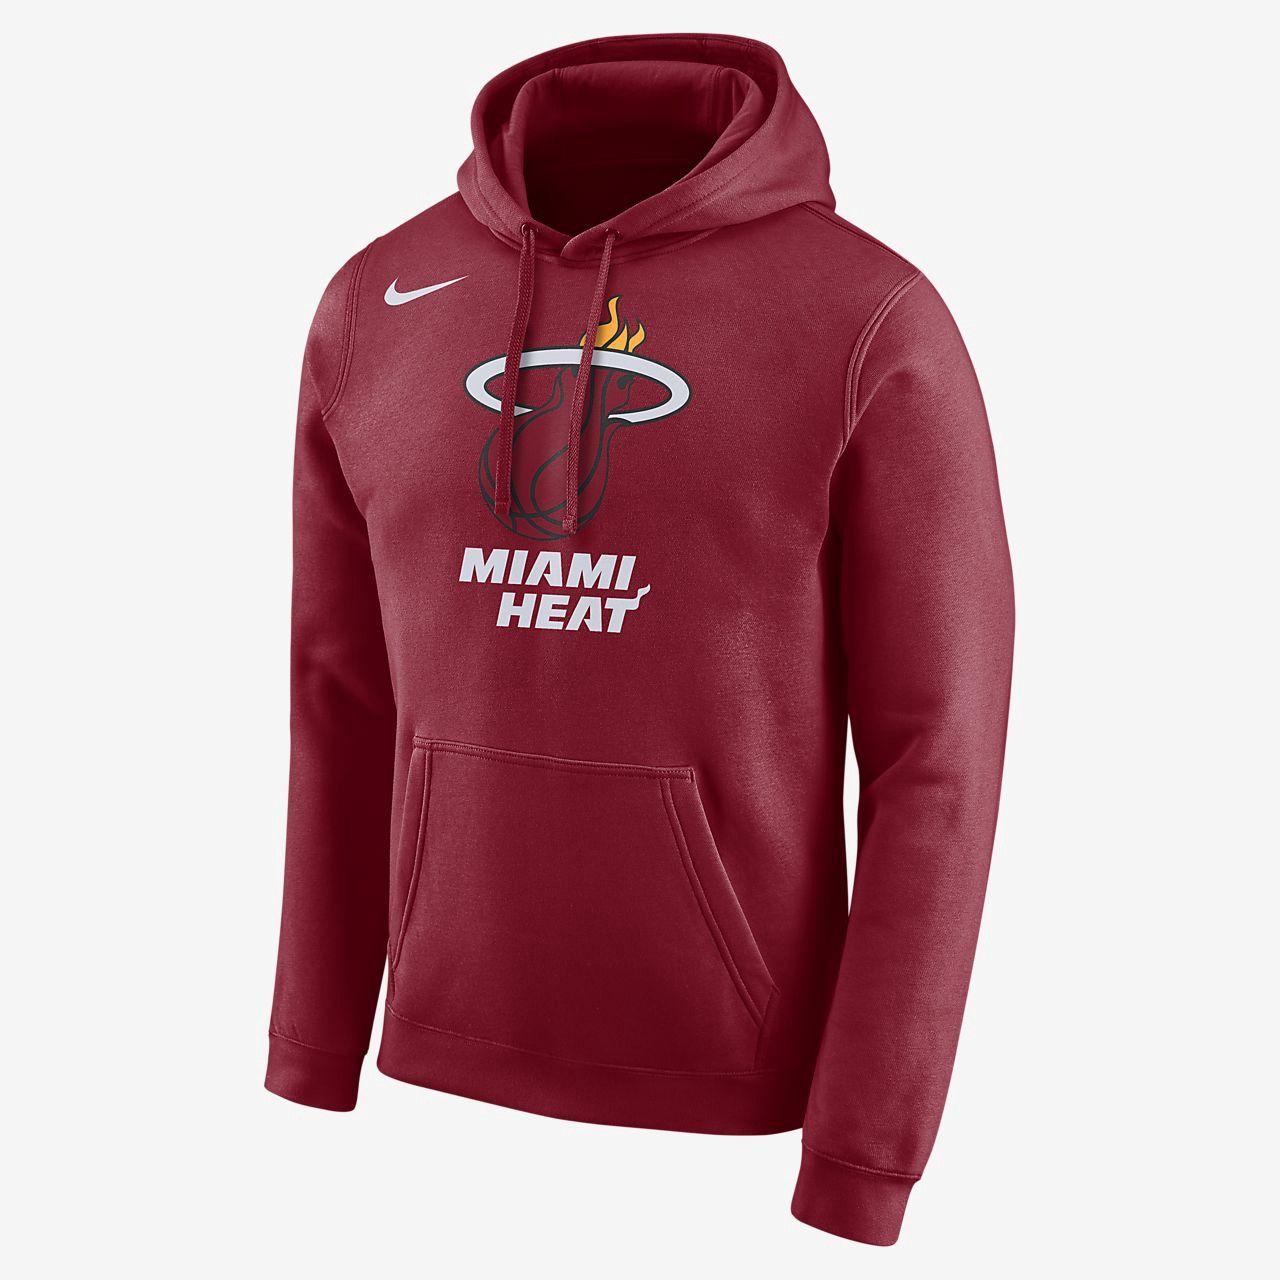 ae9c97c0b Nike Miami Heat Men s Logo Nba Hoodie - 3XL Red